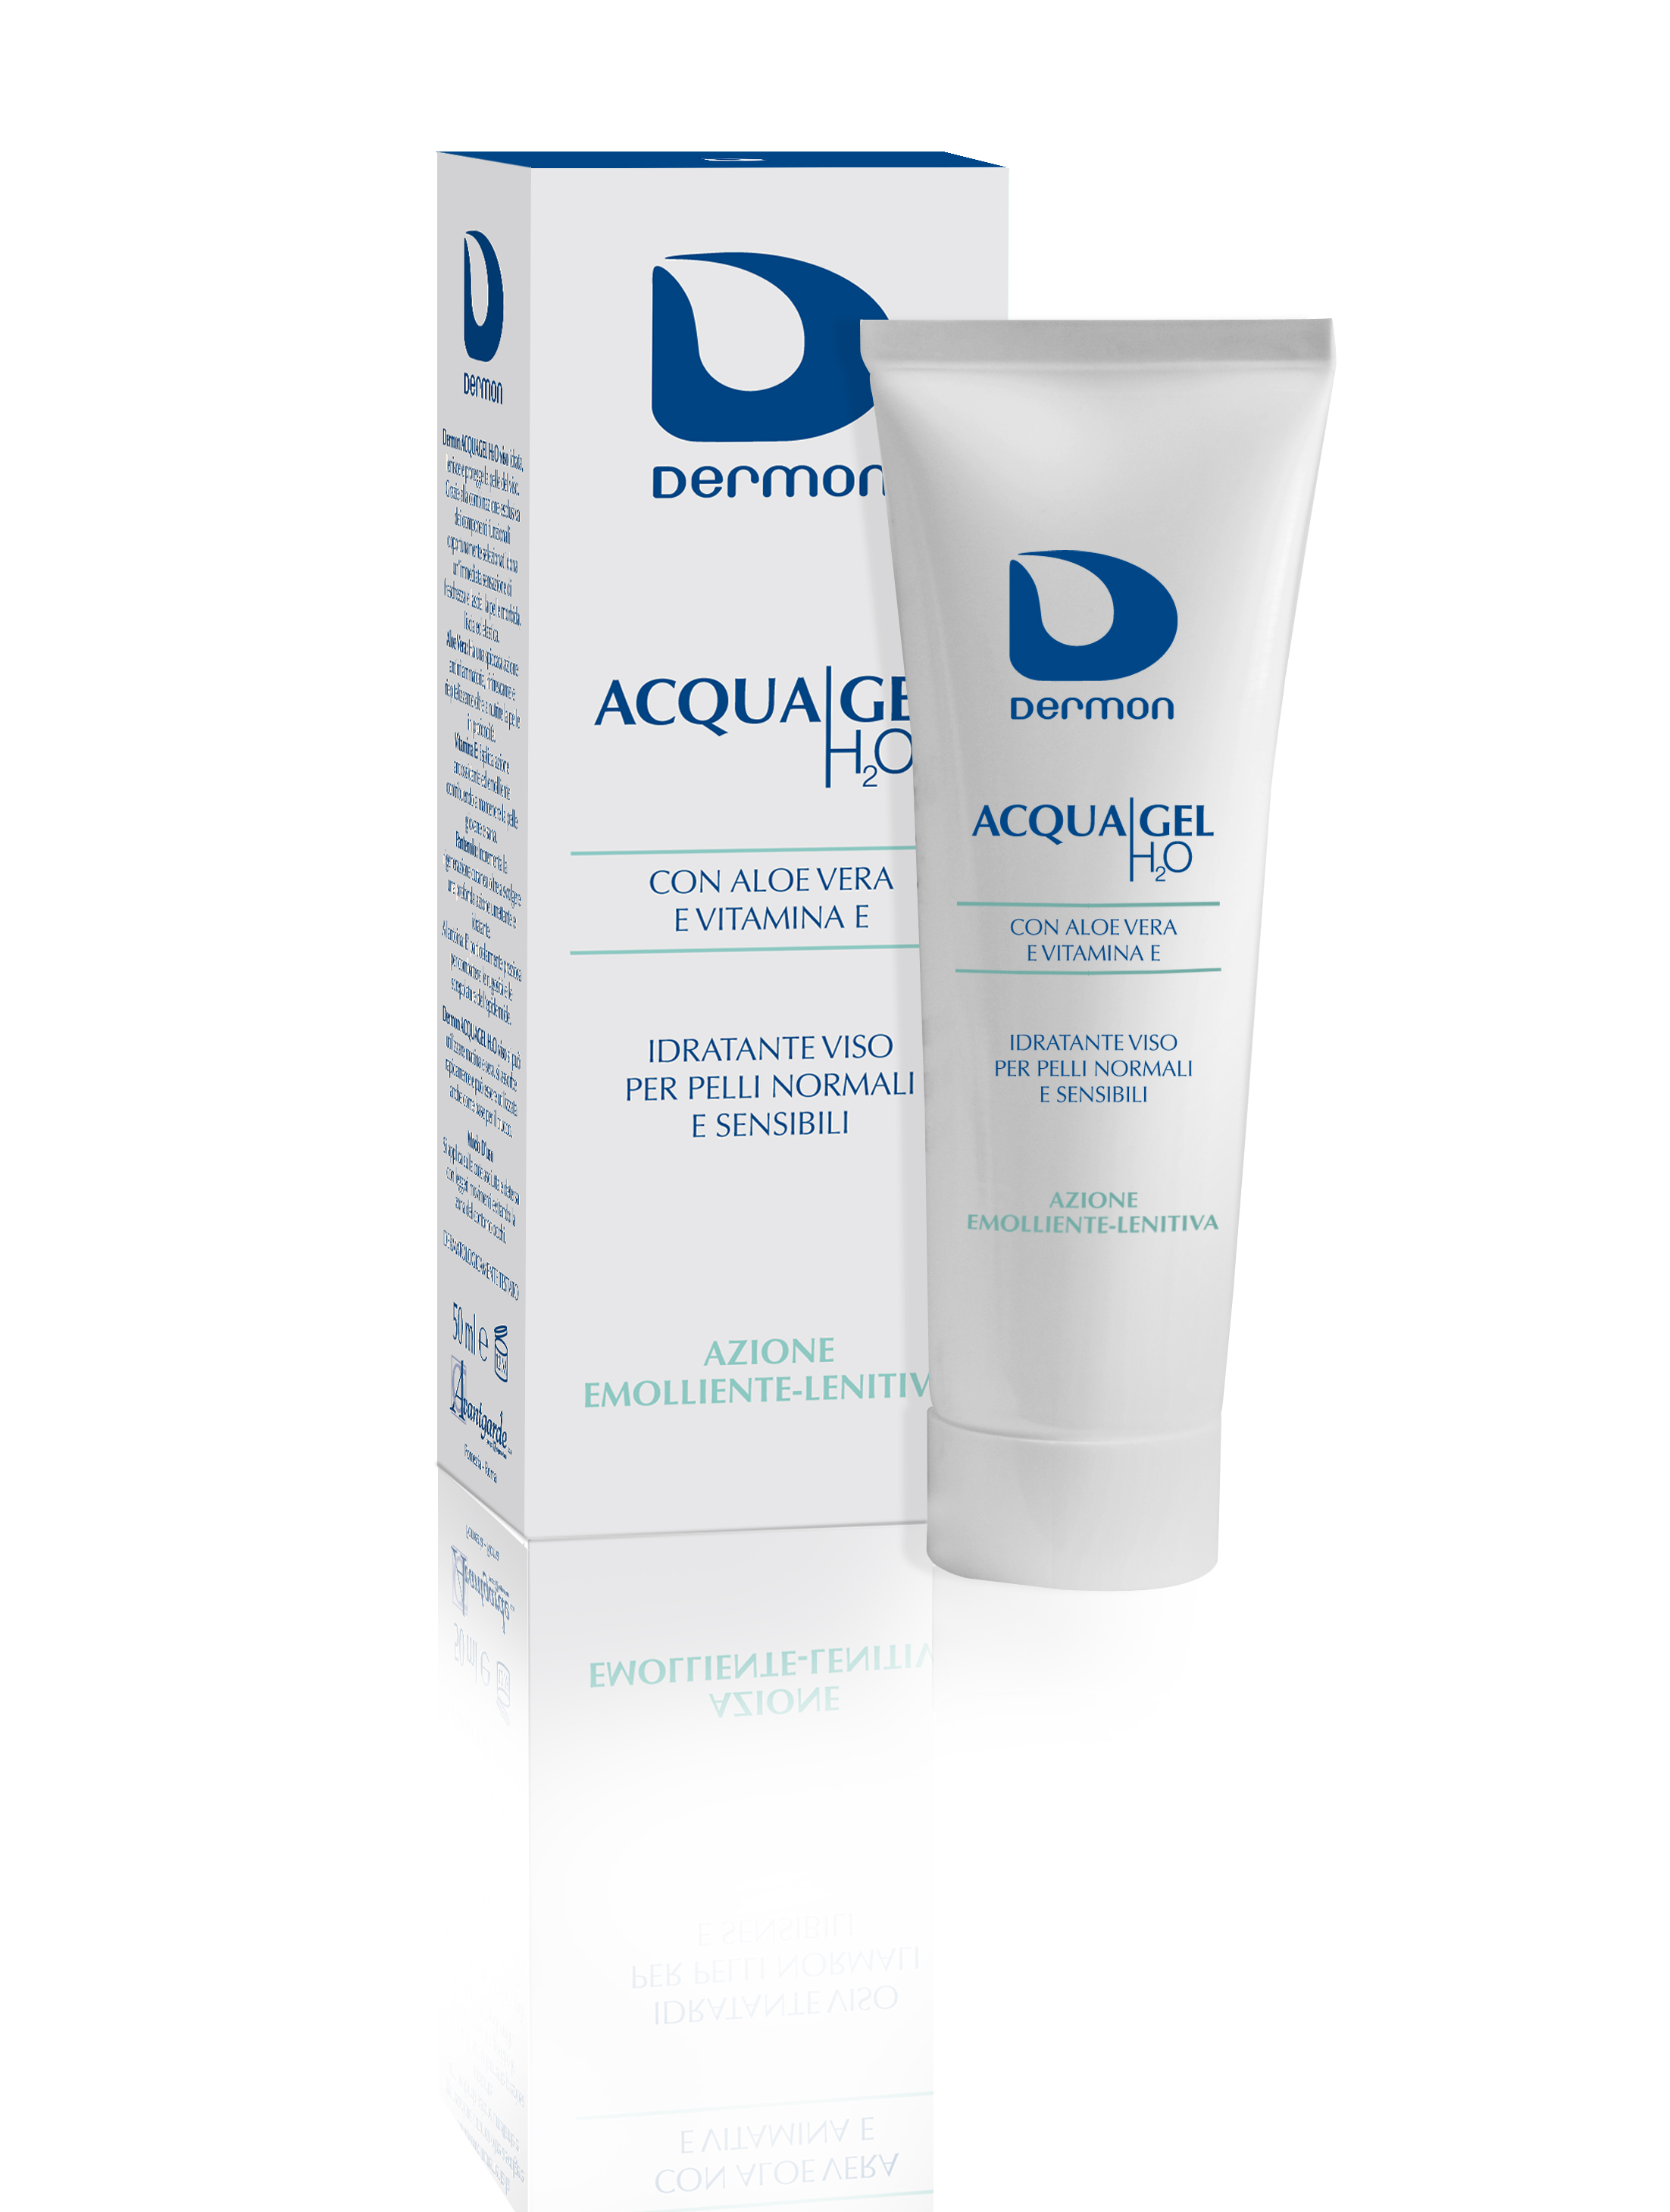 Nuova crema idratante viso Dermon Acqua Gel H2O da Avantgarde